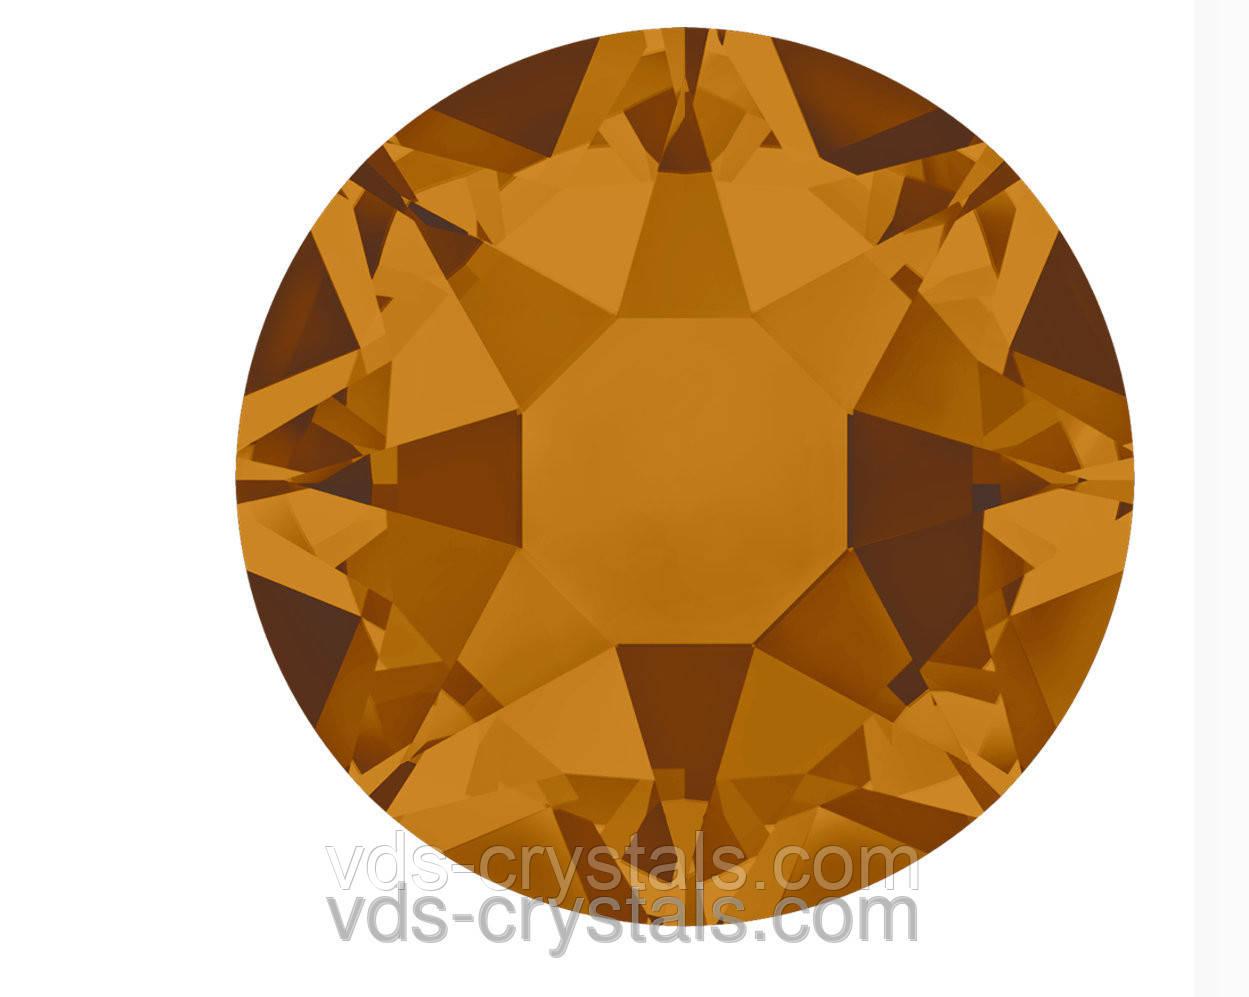 Кристаллы Swarovski клеевые горячей фиксации 2078 Crystal Copper F (001 COP)